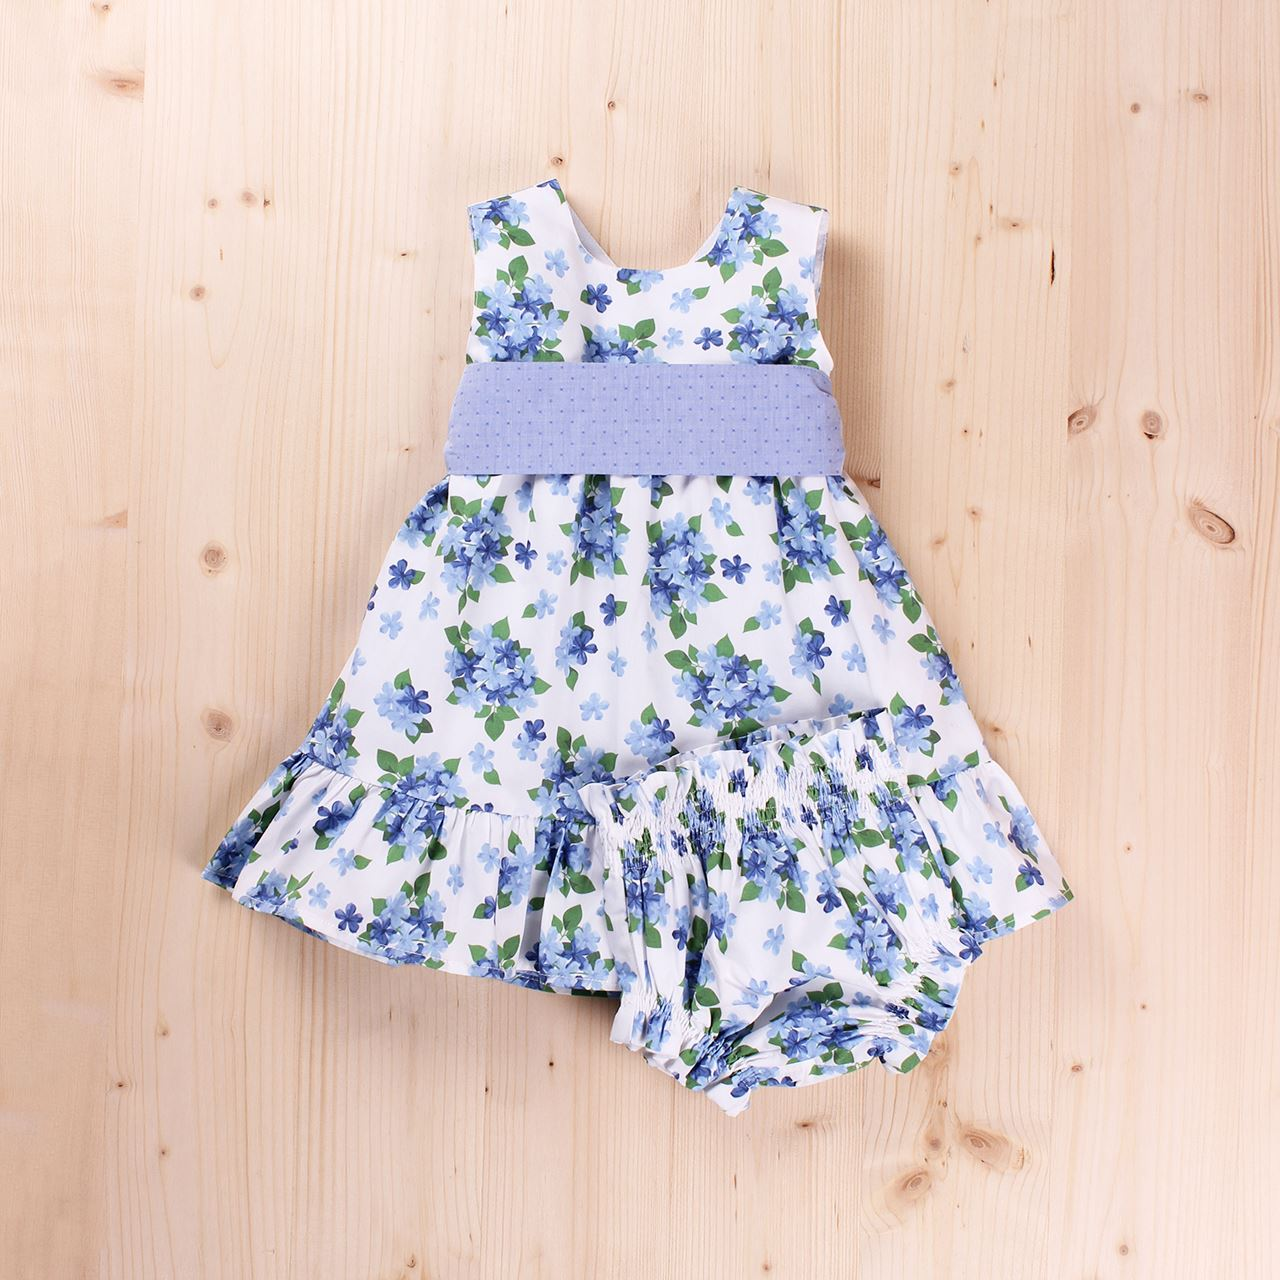 0ef18ab7d4ce Vestido bebé dobby flores y lazo, con braguita. Dadati - Moda infantil